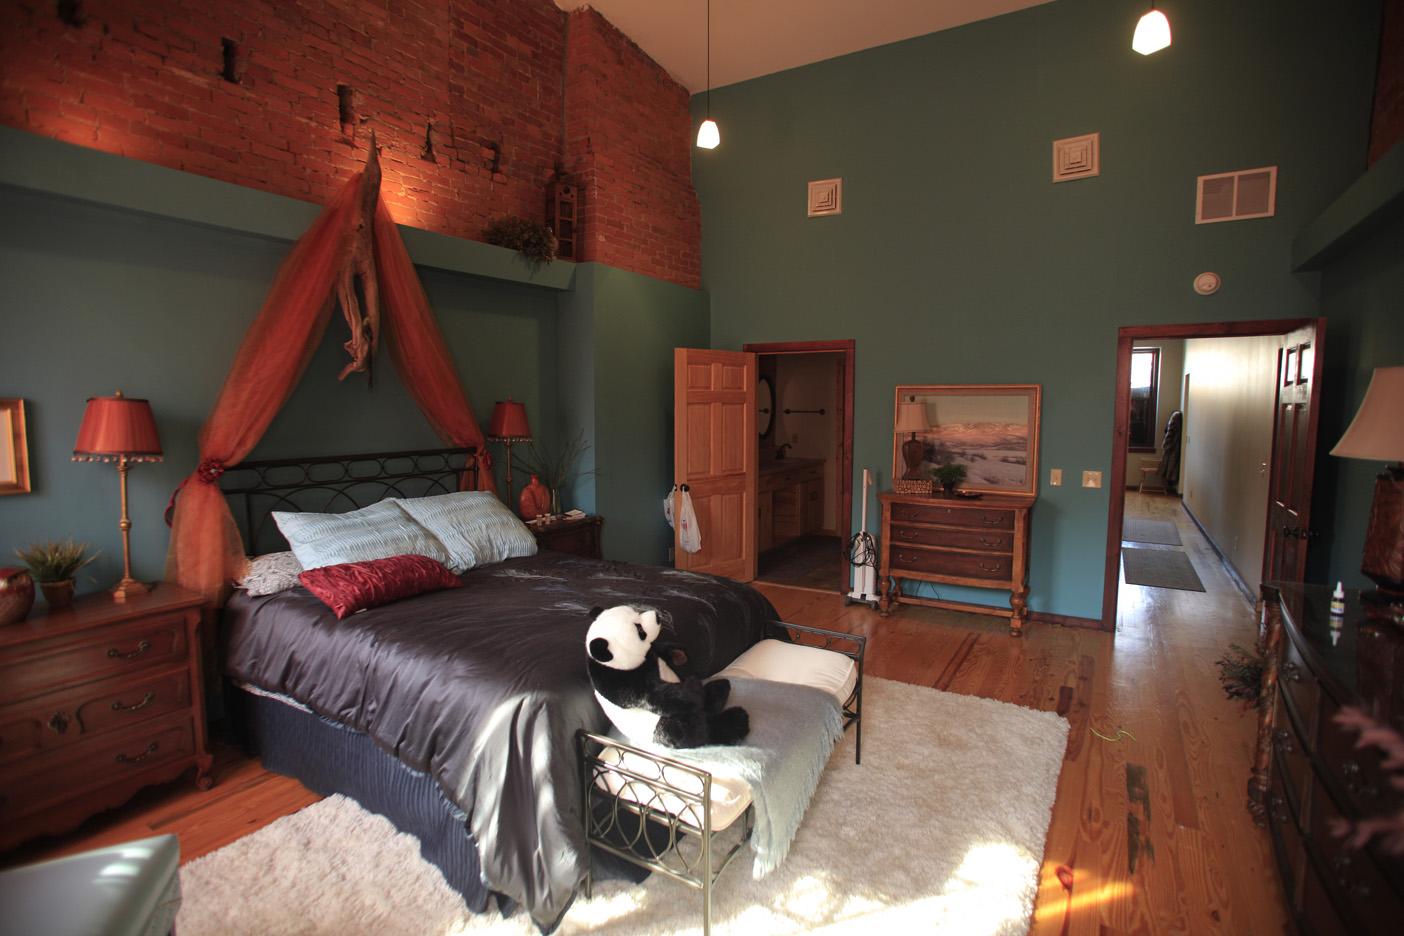 Newark Ohio Room For Rent